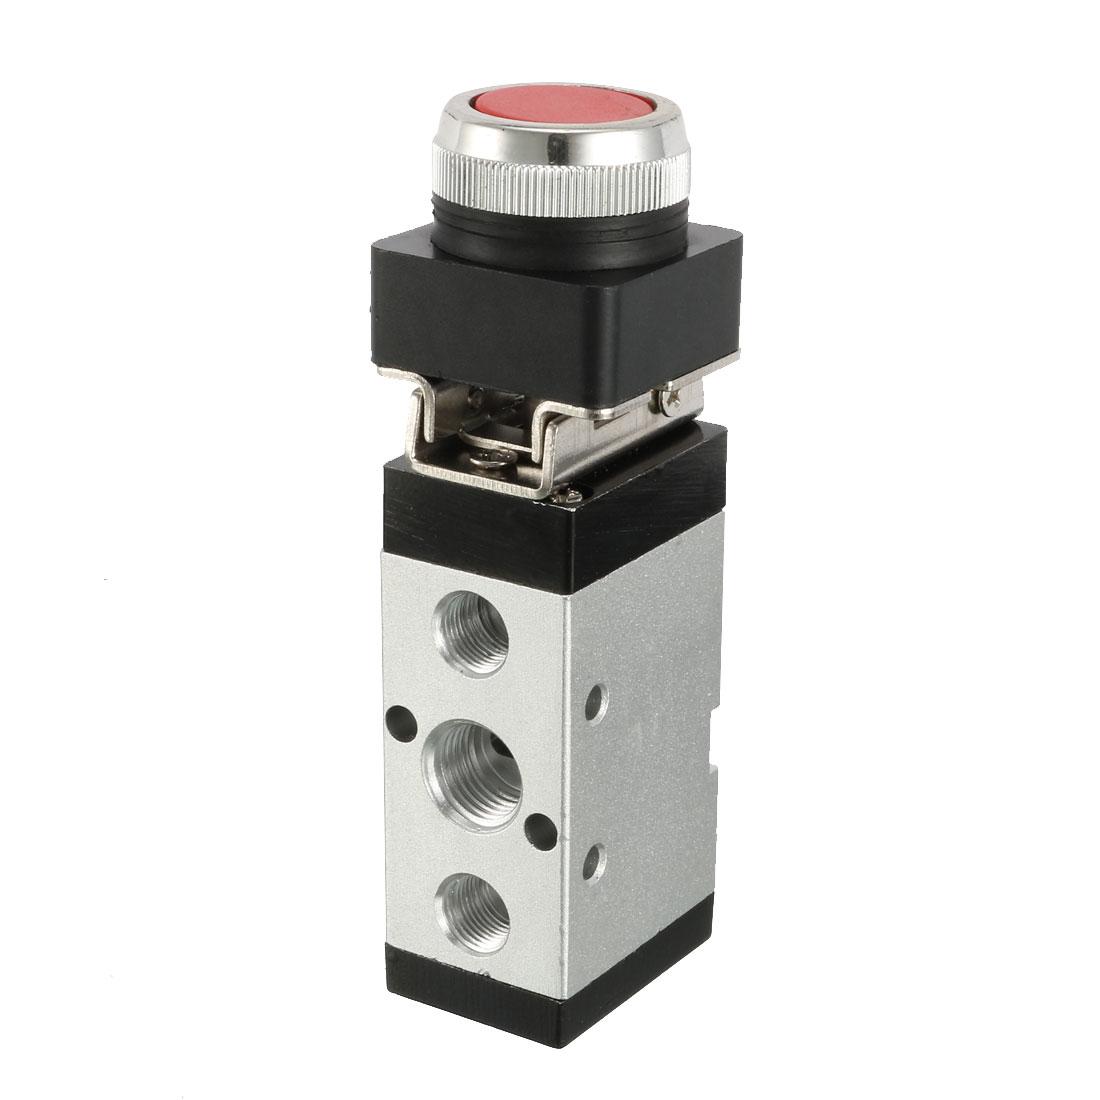 MSV-86522PPL 1/4BSP 5 Way 2 Position Momentary Flat Push Button Pneumatic Mechanical Valve